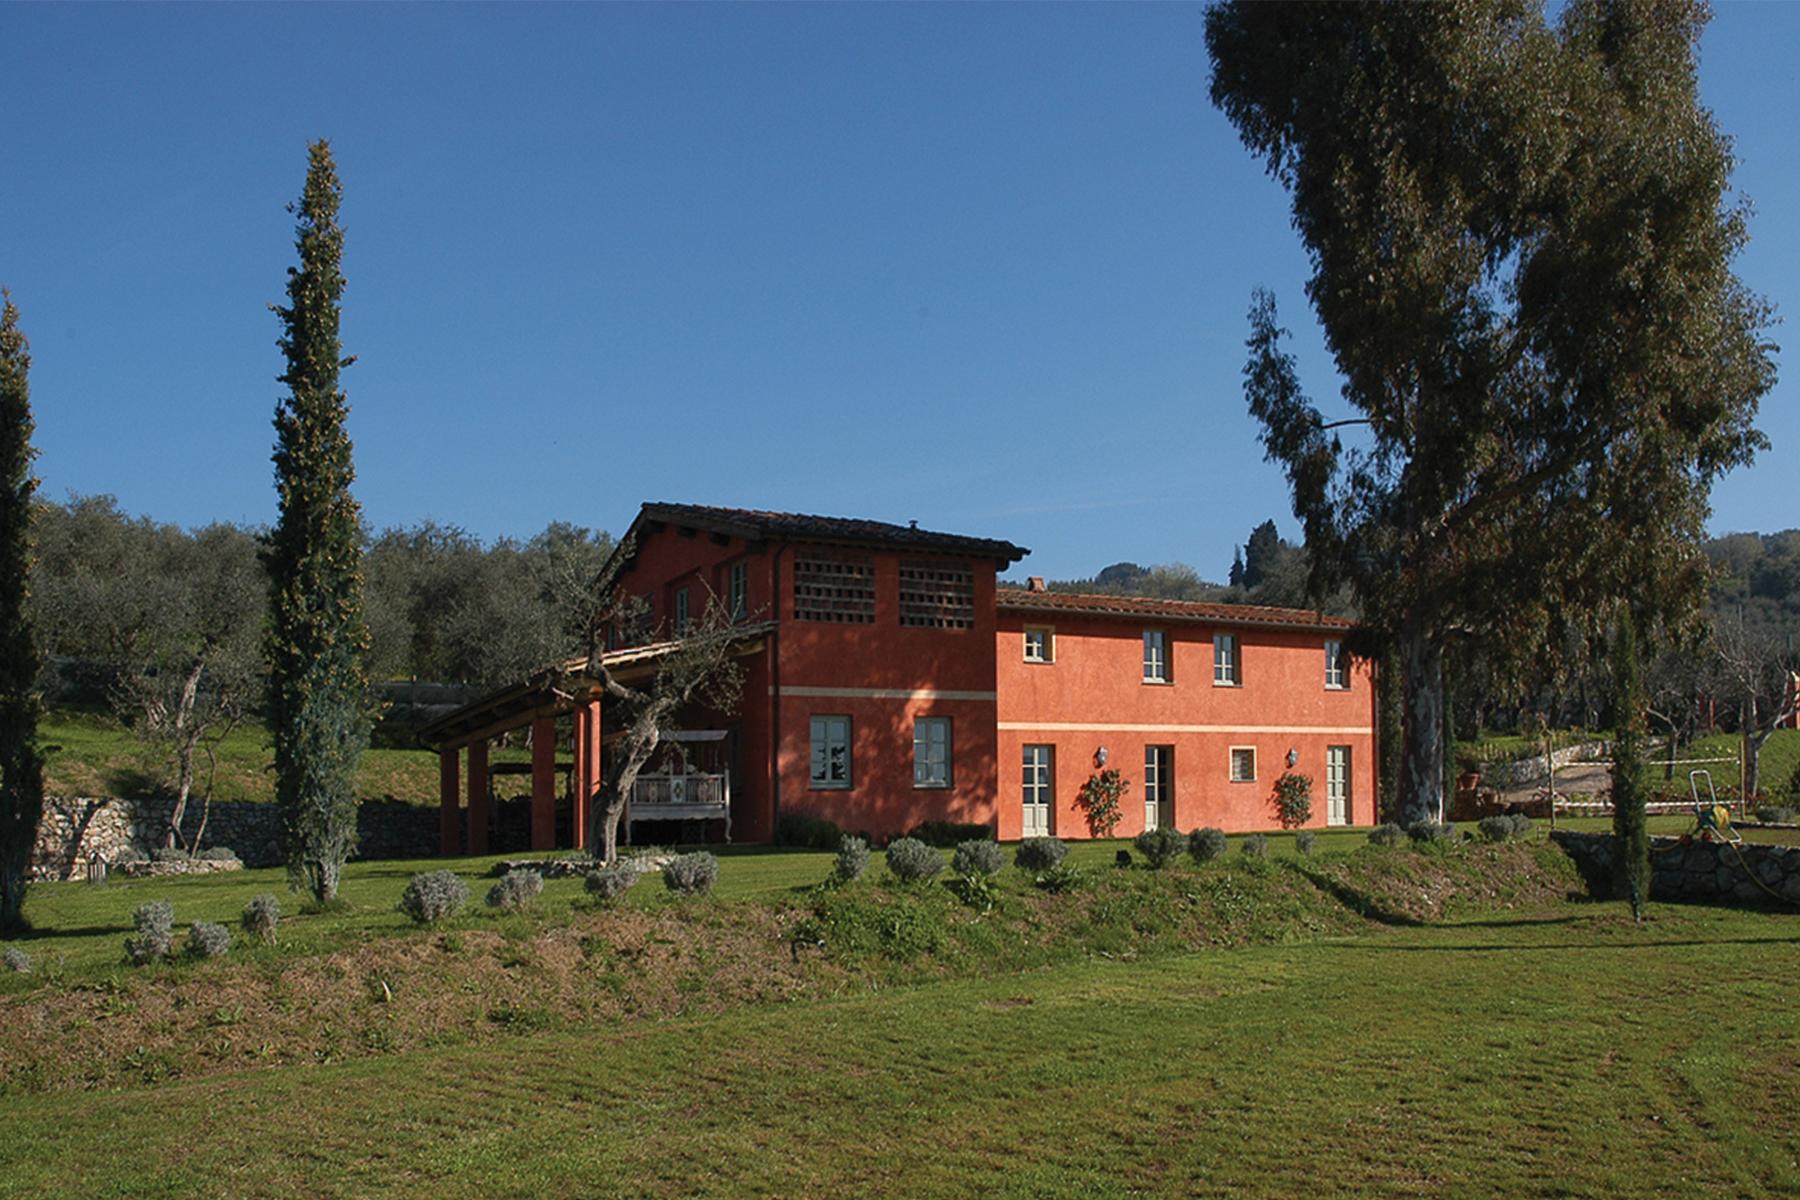 Casa indipendente in Vendita a Massarosa: 5 locali, 350 mq - Foto 4